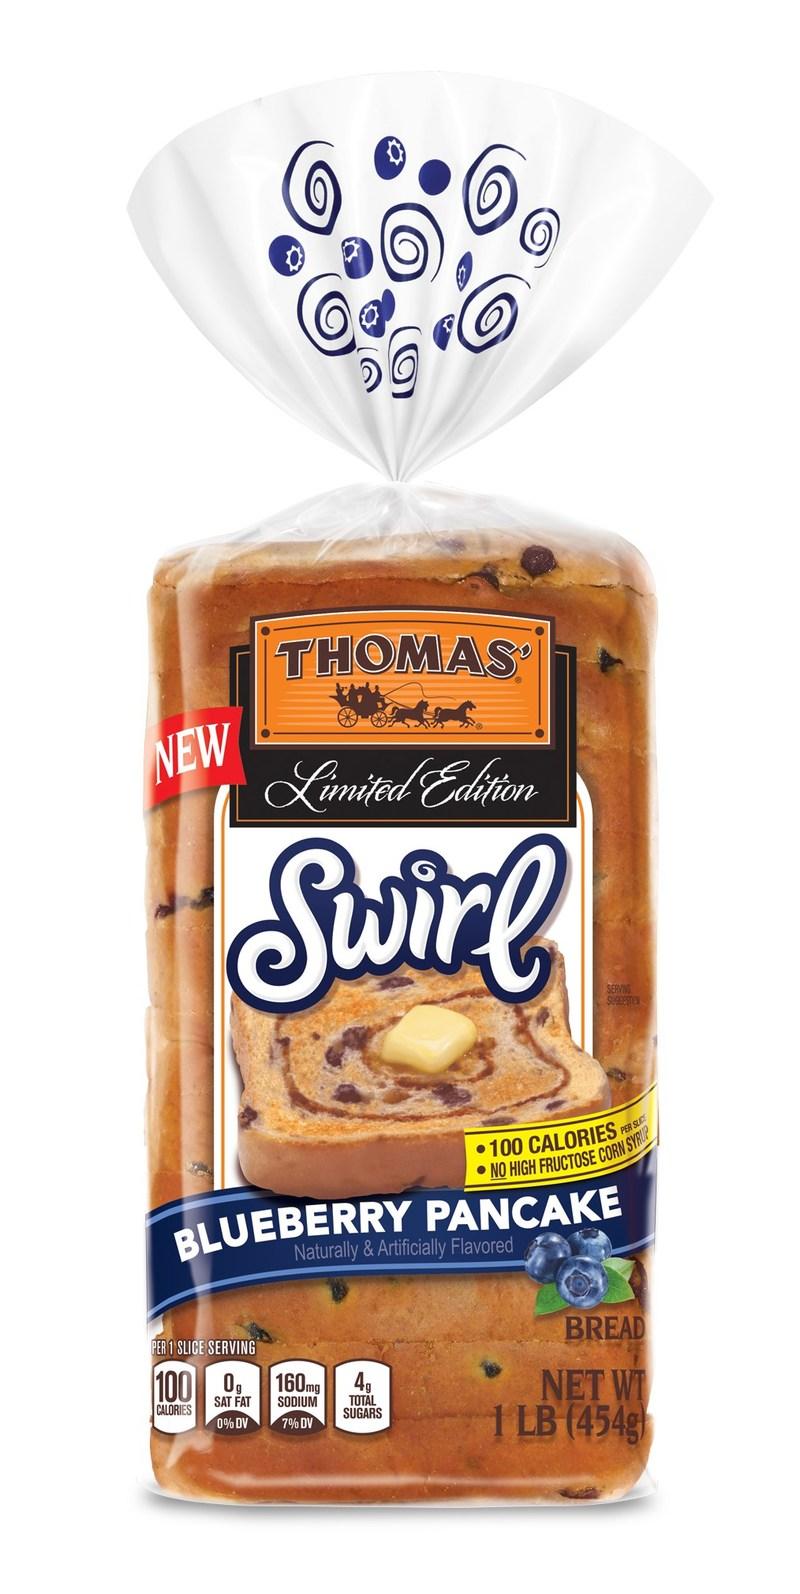 NEW Thomas' Limited Edition Blueberry Pancake Swirl Bread